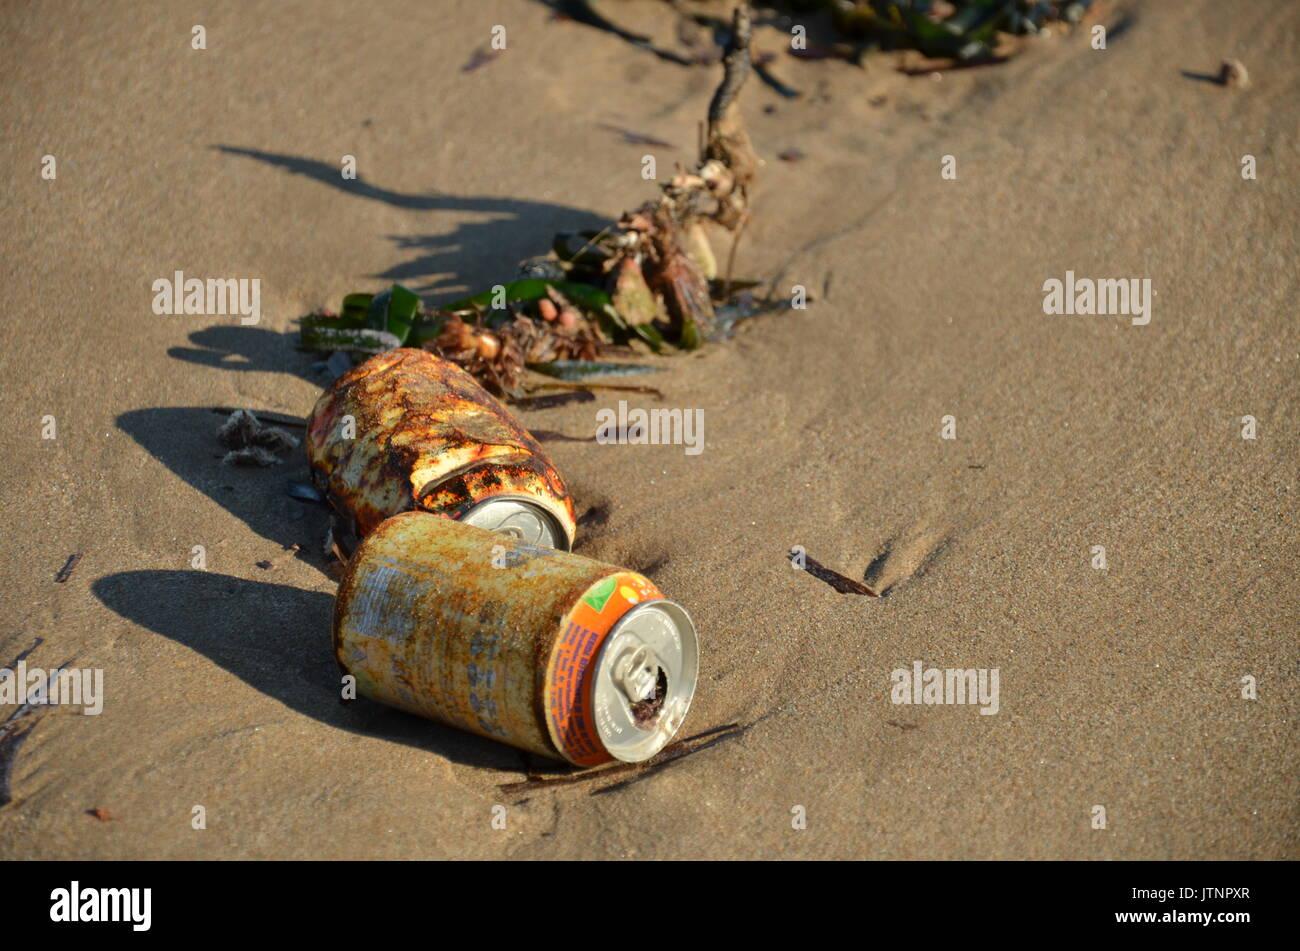 trash on a beach - Stock Image